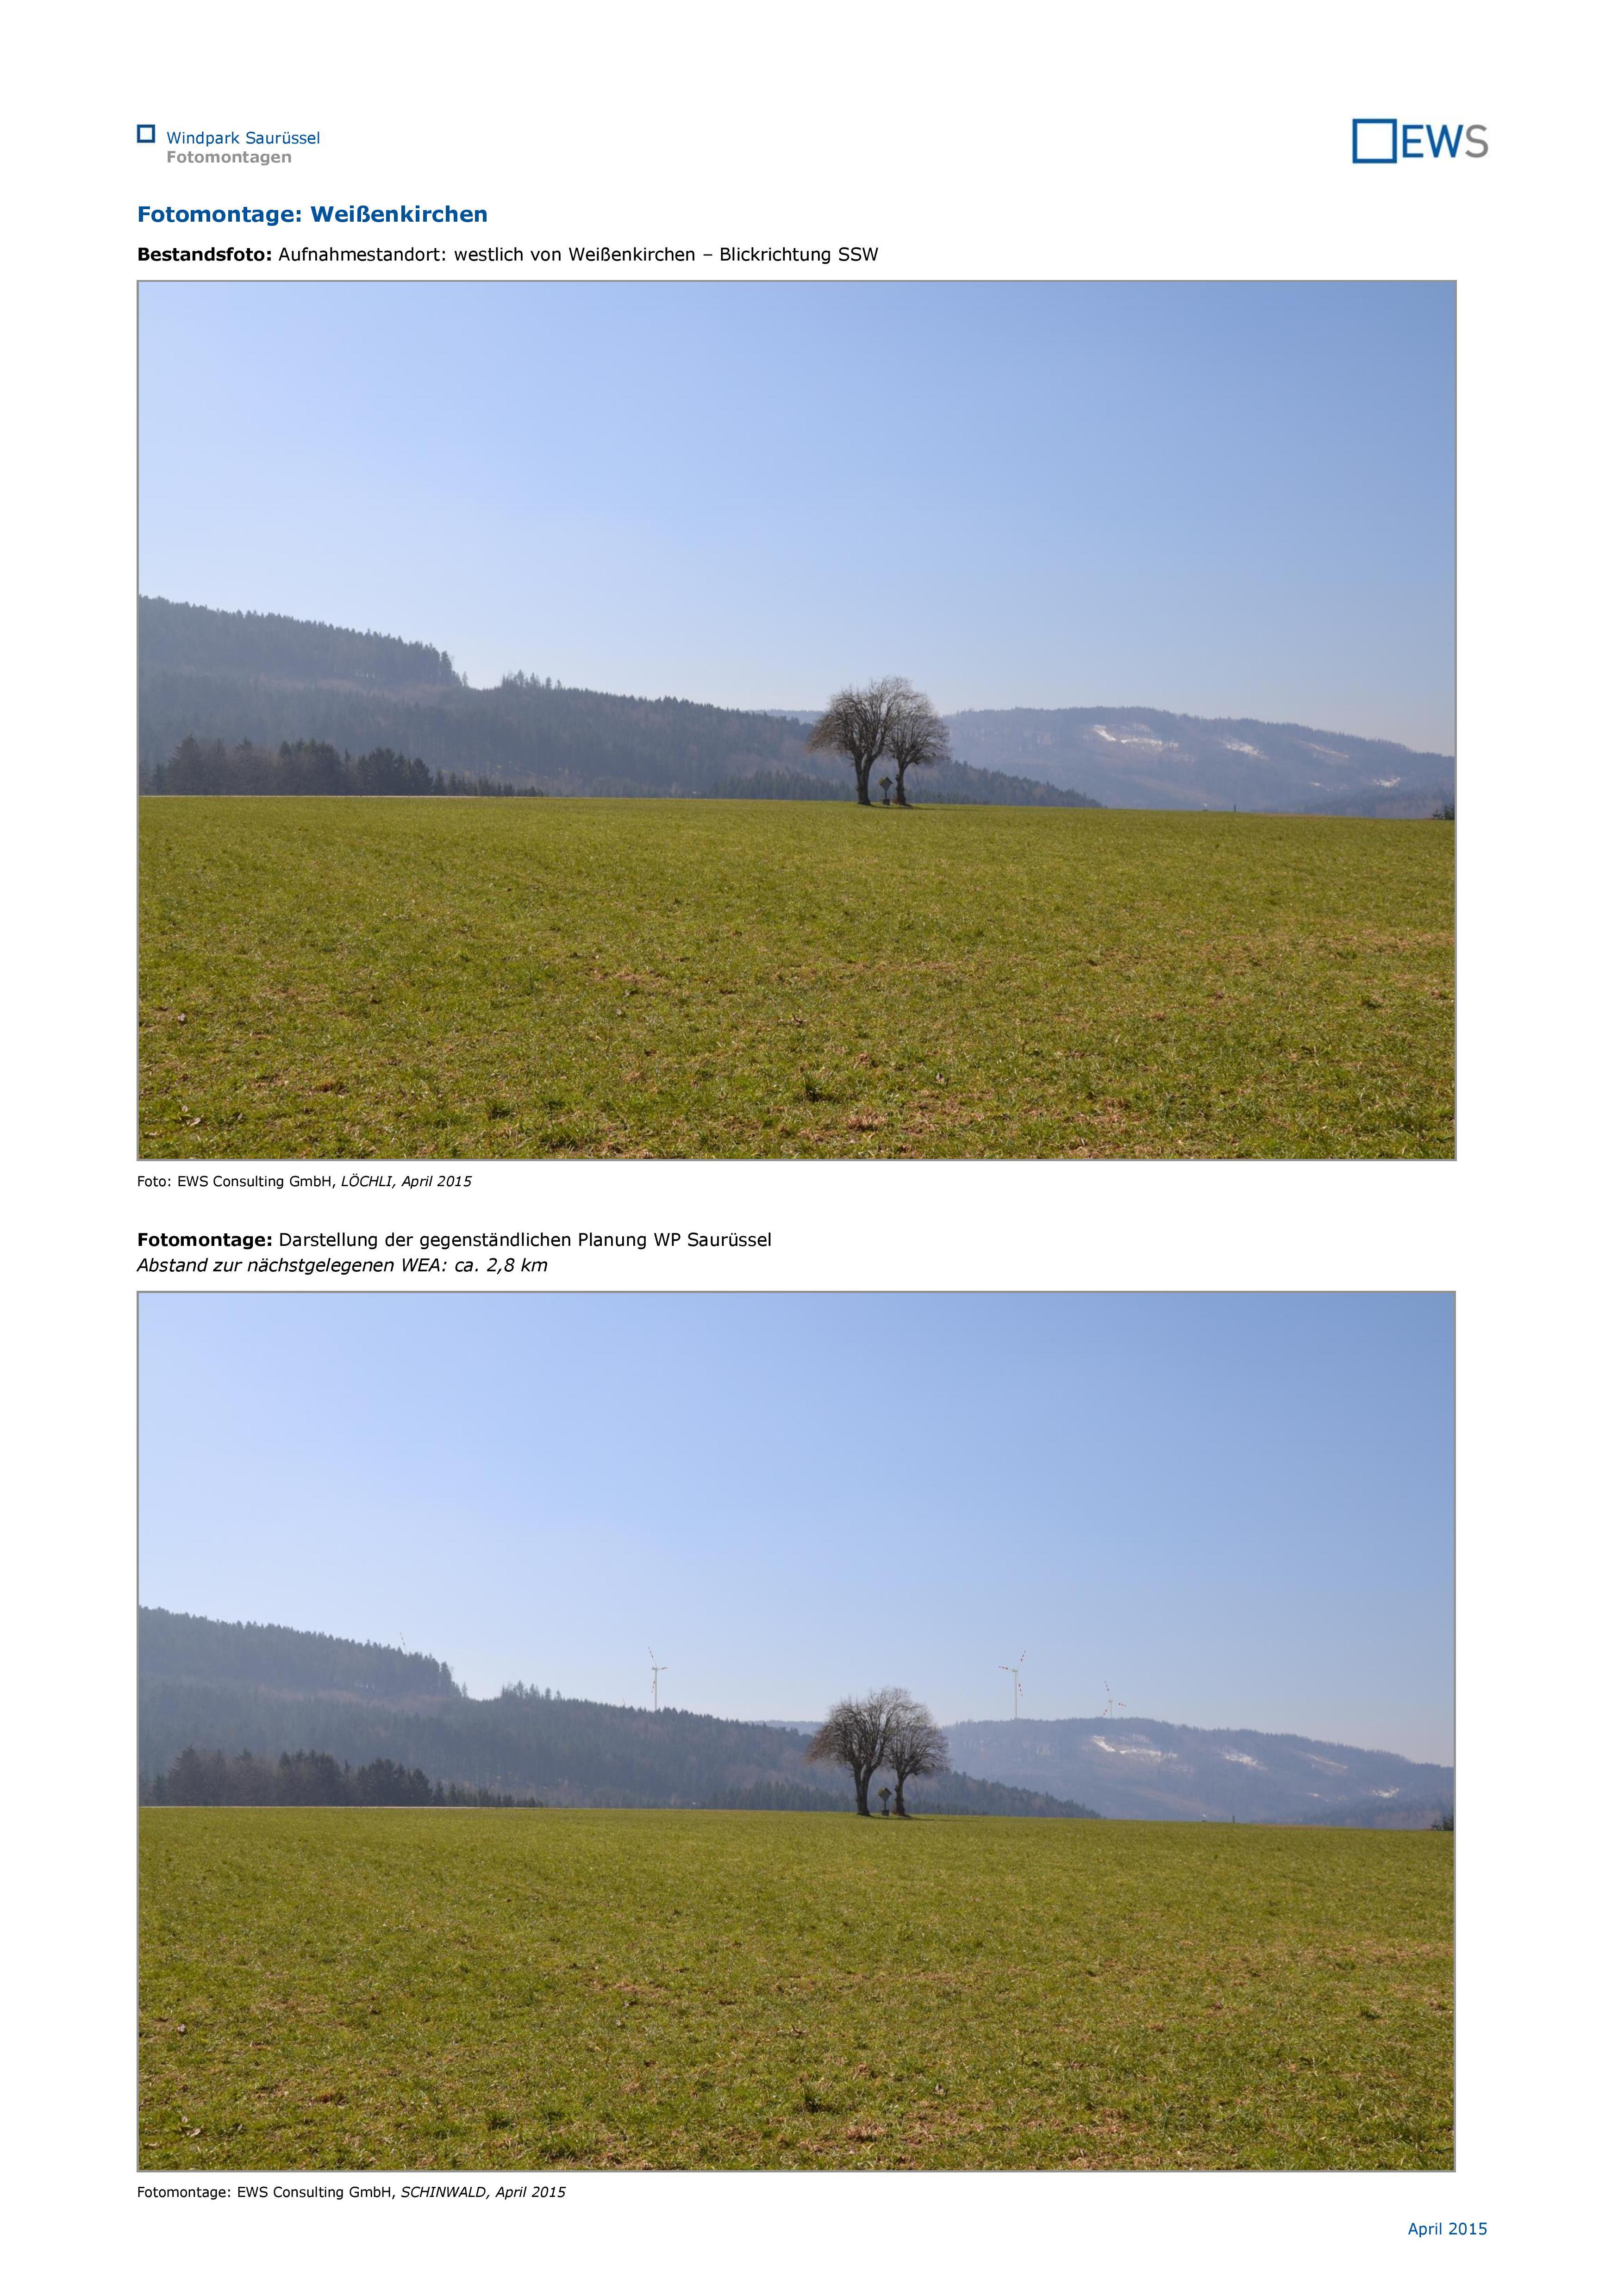 fm_weissenkirchen_a3-page-001